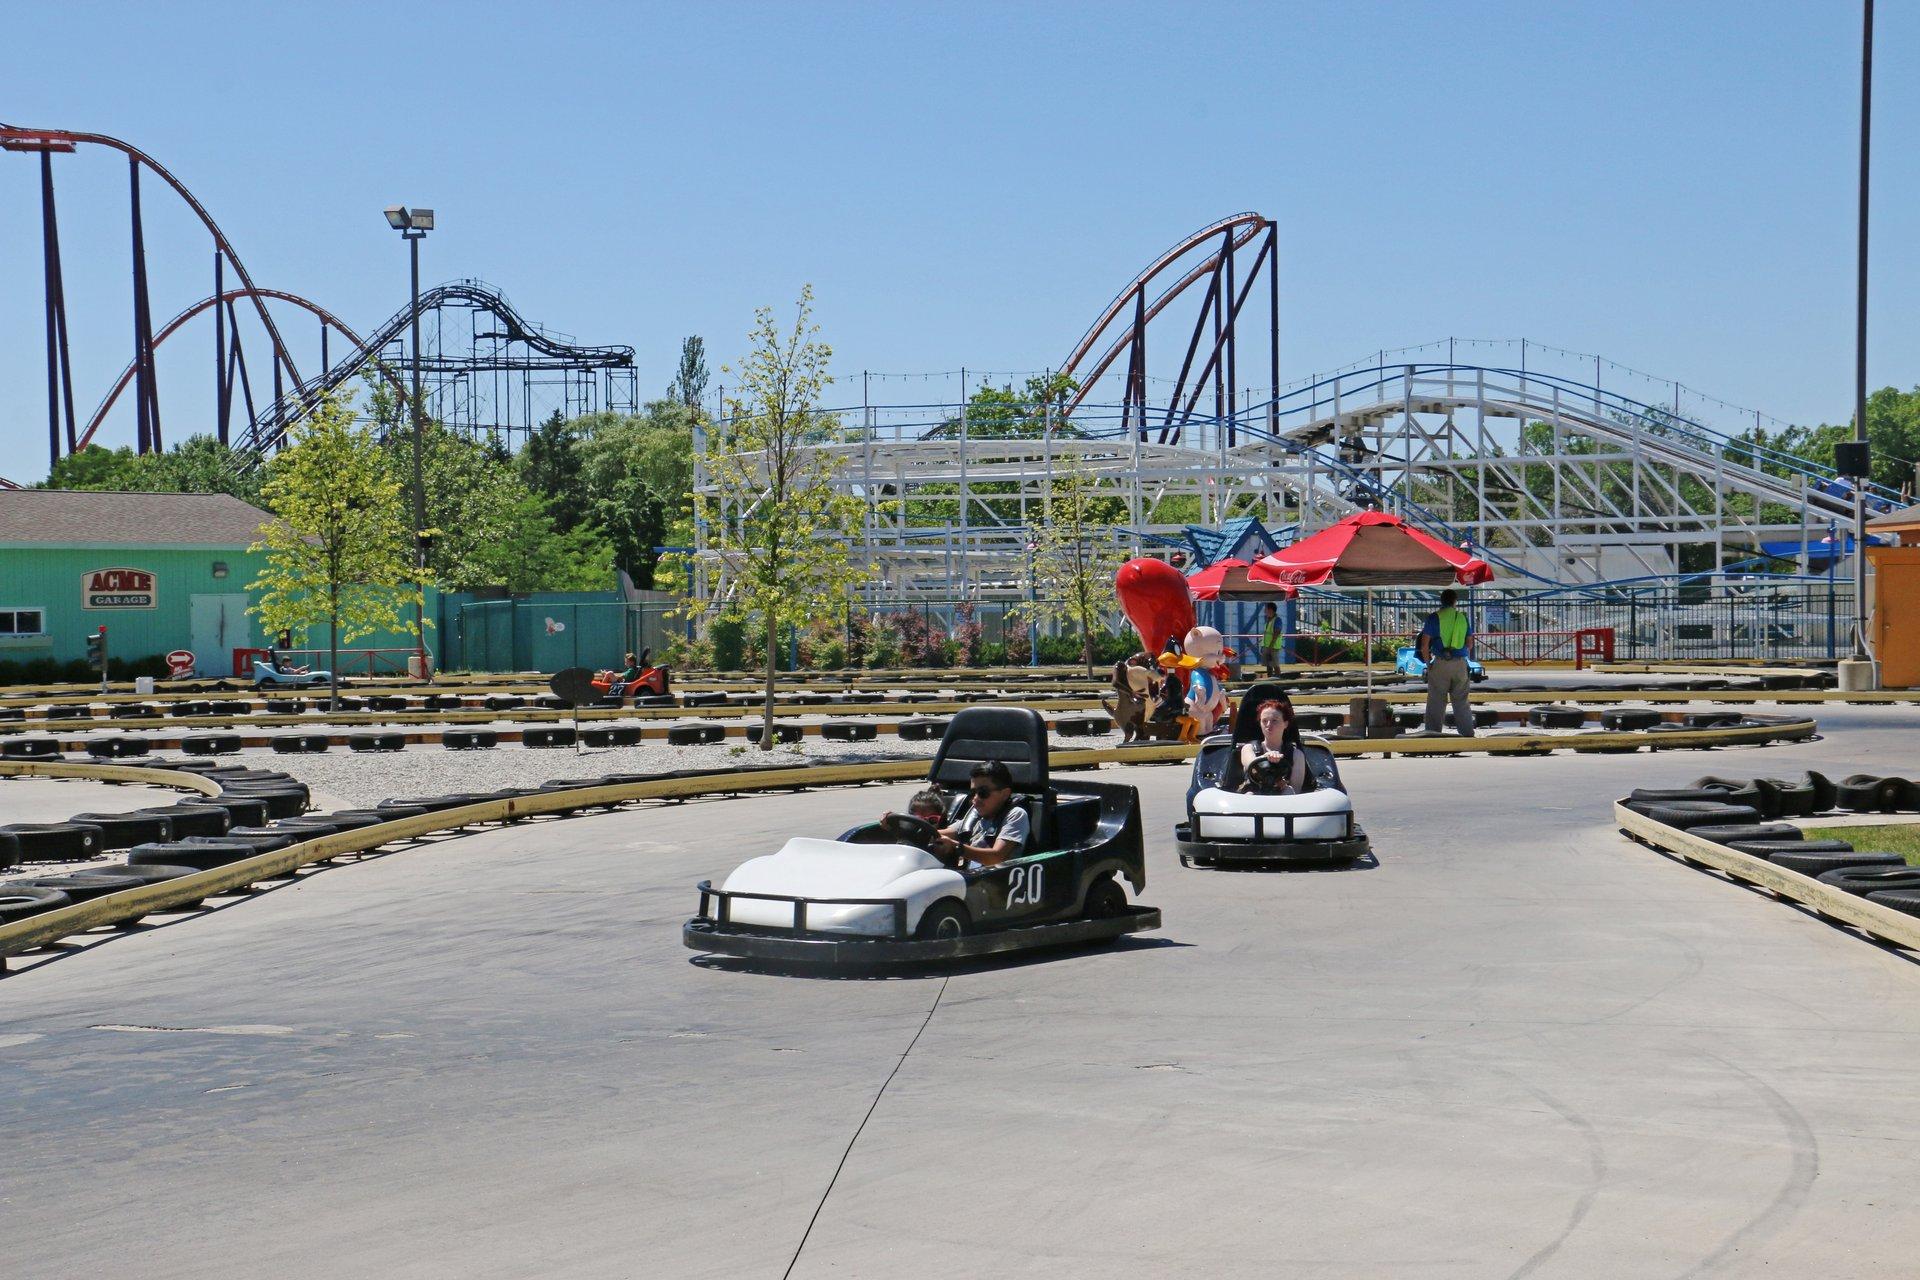 Winner's Circle Go Karts | Six Flags Great America